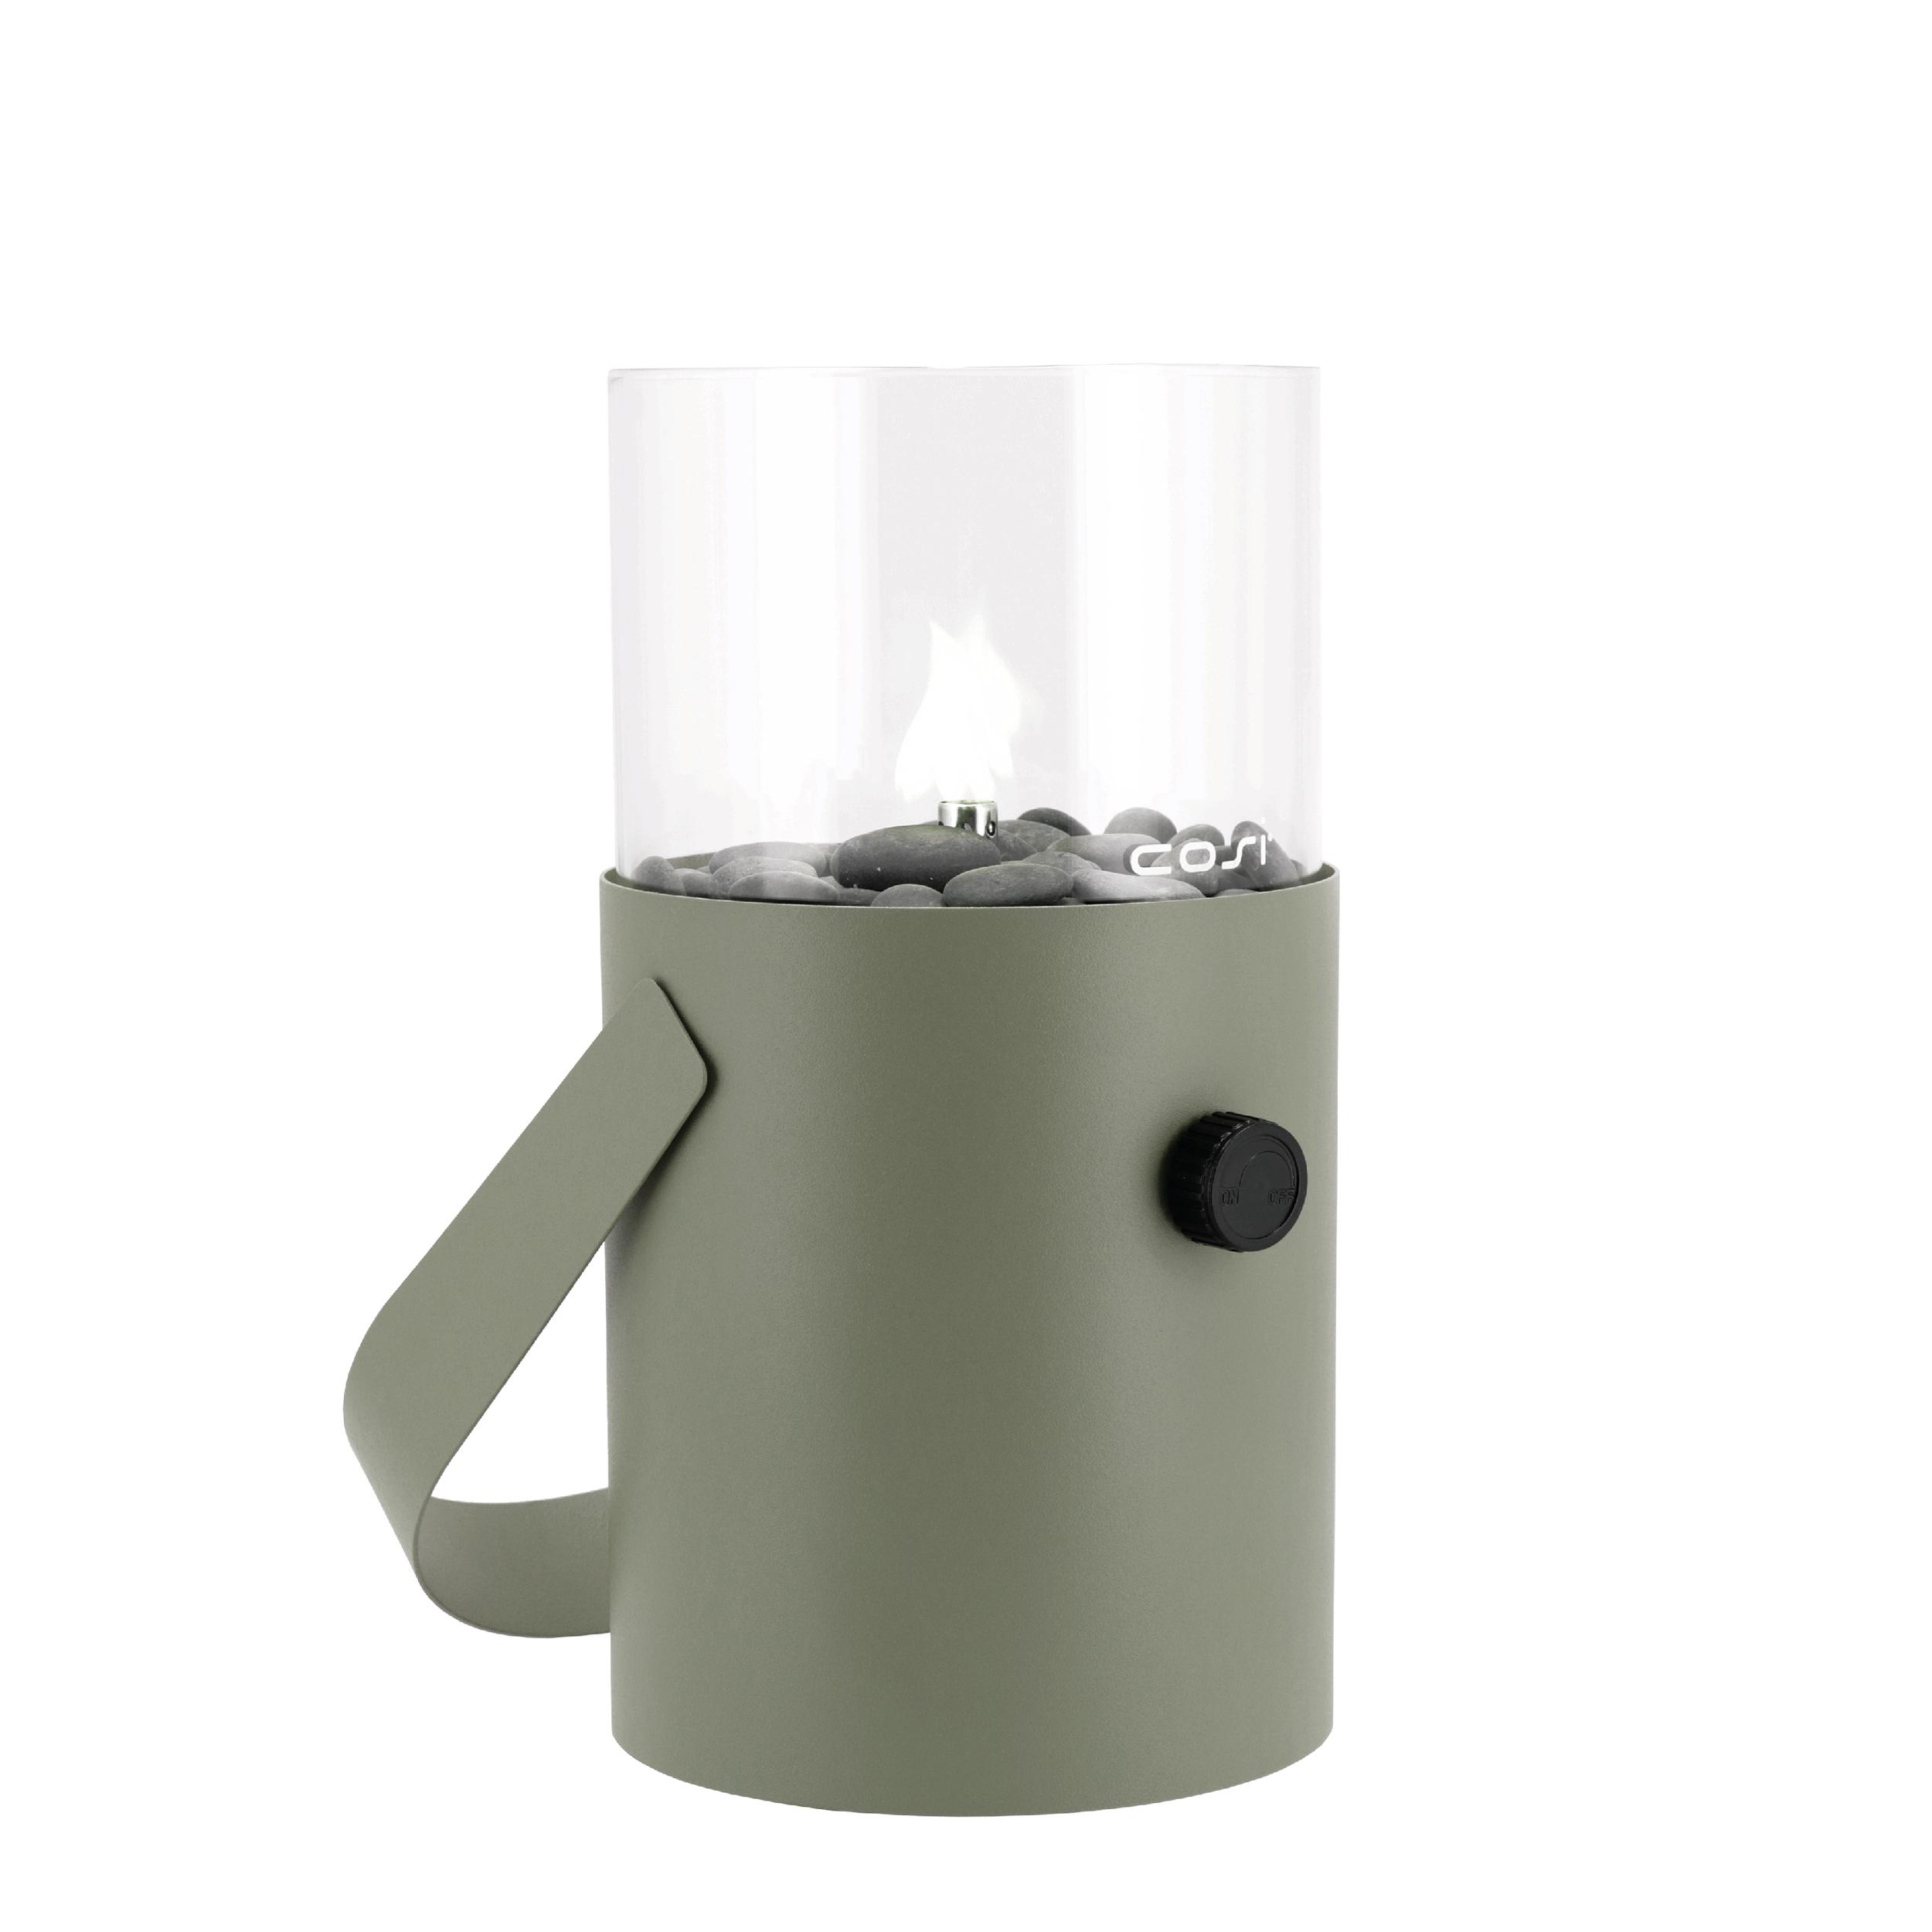 5801020 - Cosiscoop Original olive - side